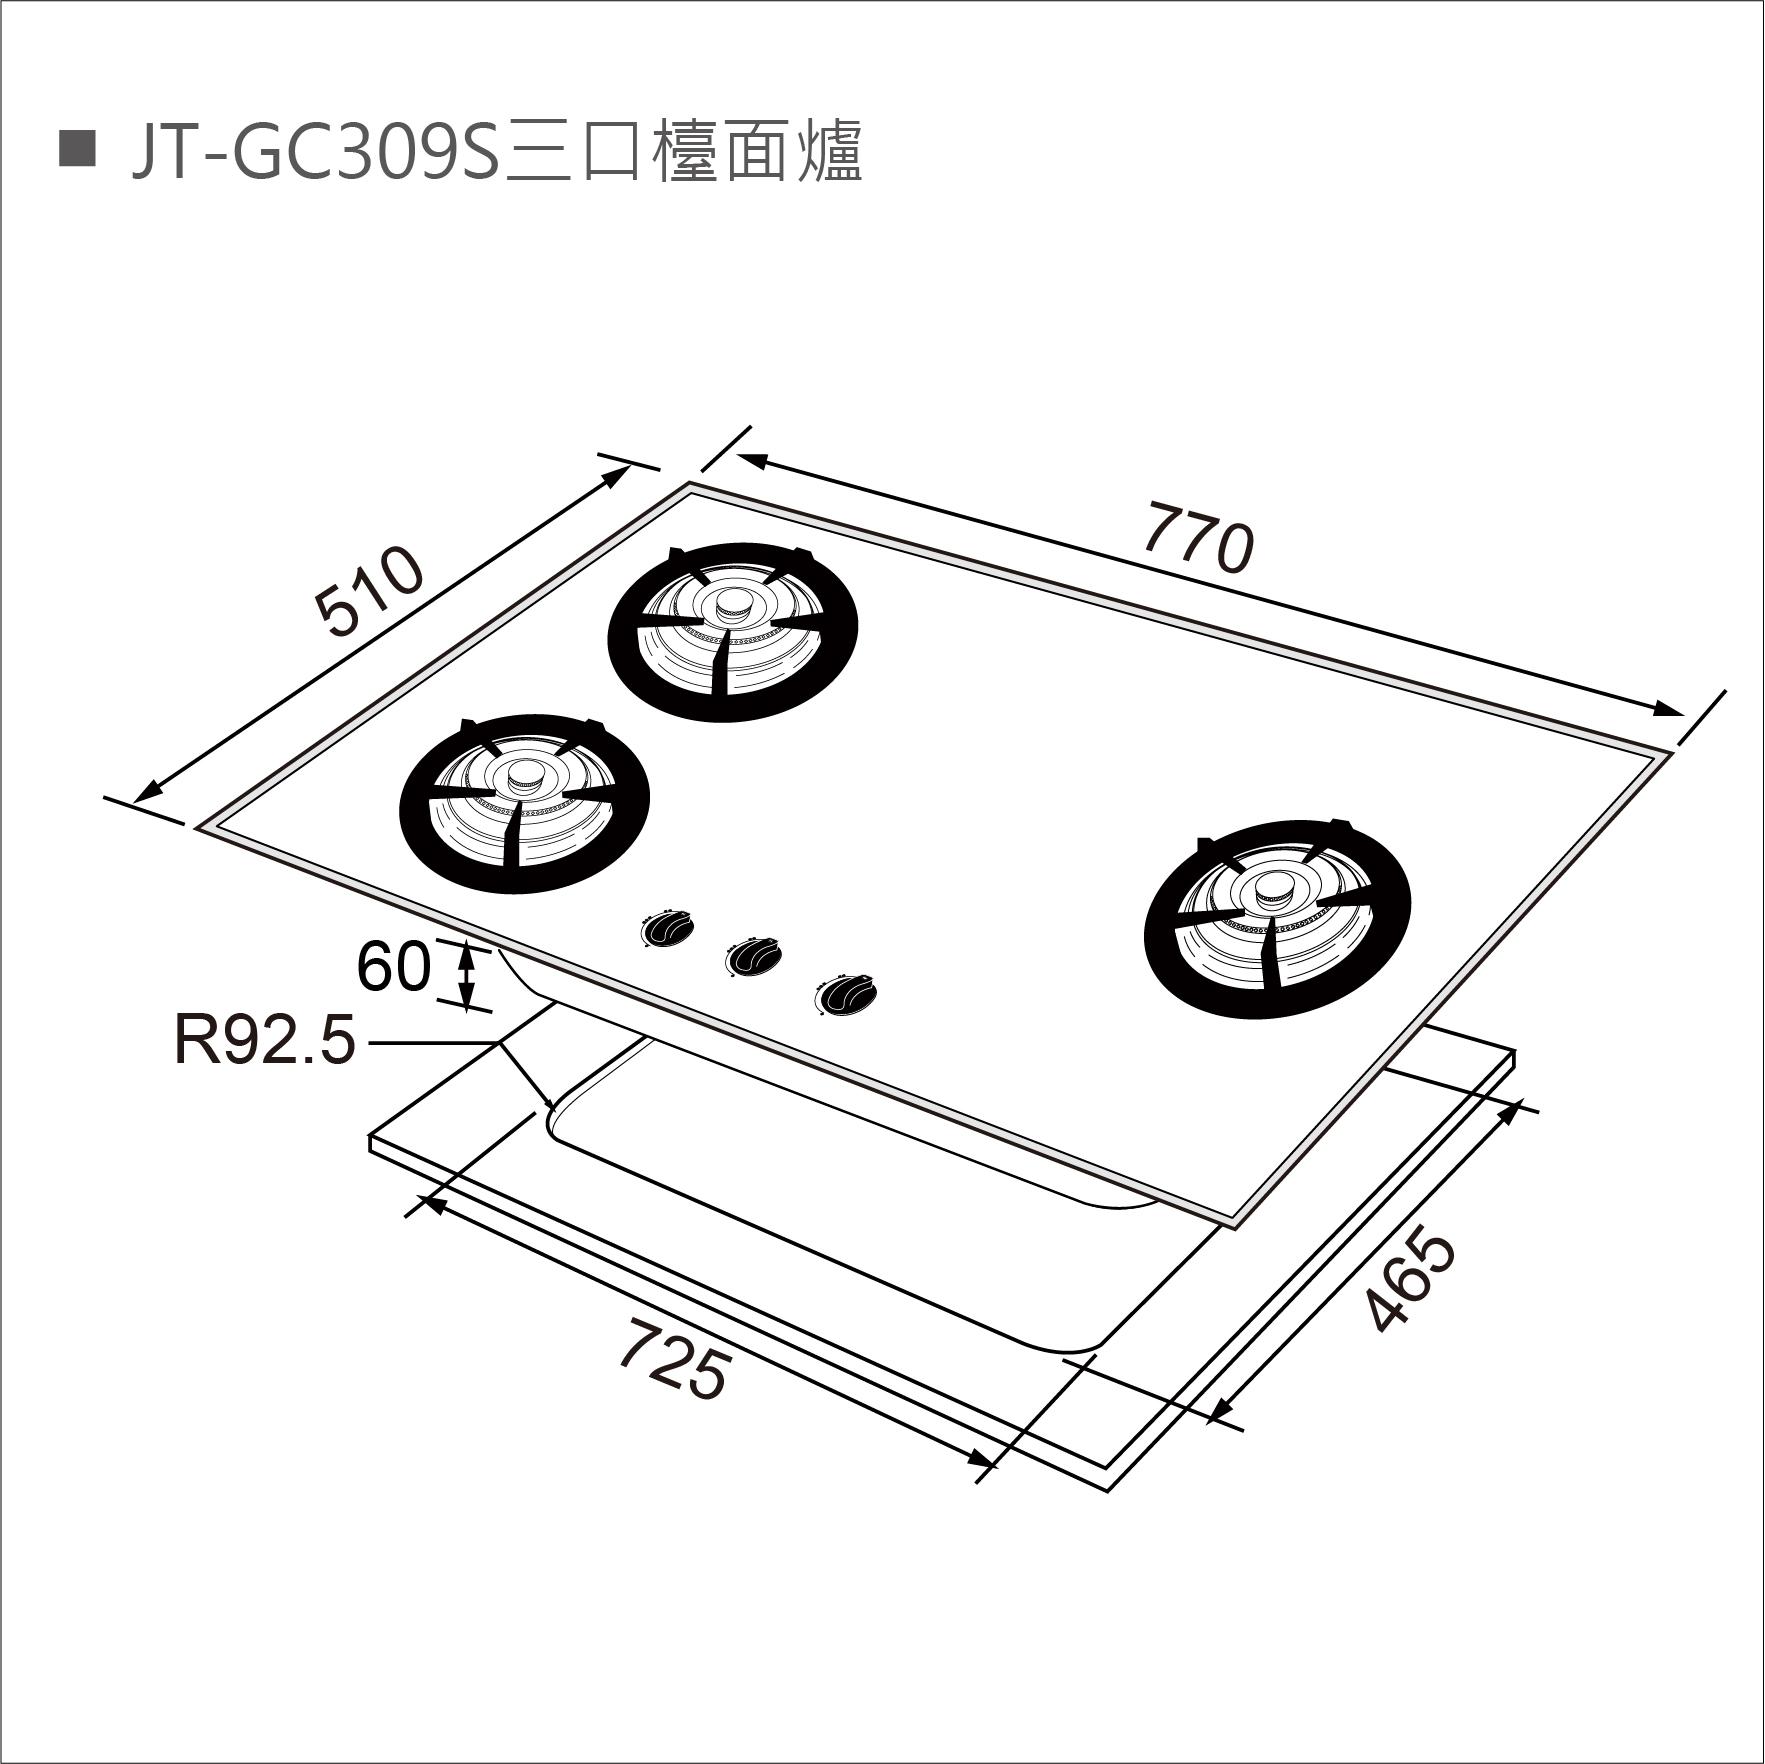 JT-GC309S 三口檯面爐-JT-GC309S